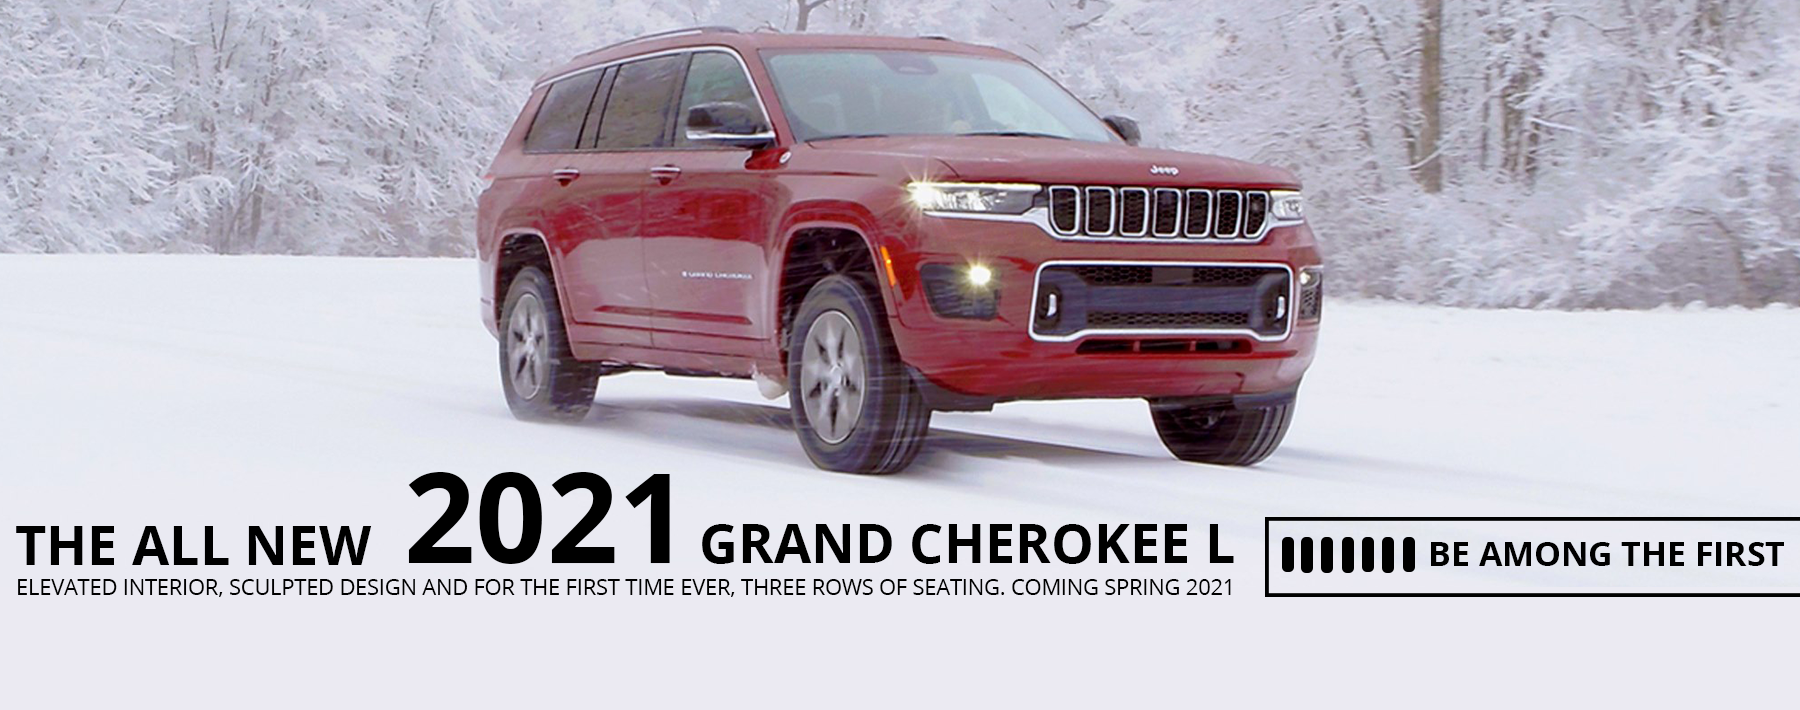 JeepGrandCherokeeL2021_LearnMore (2)